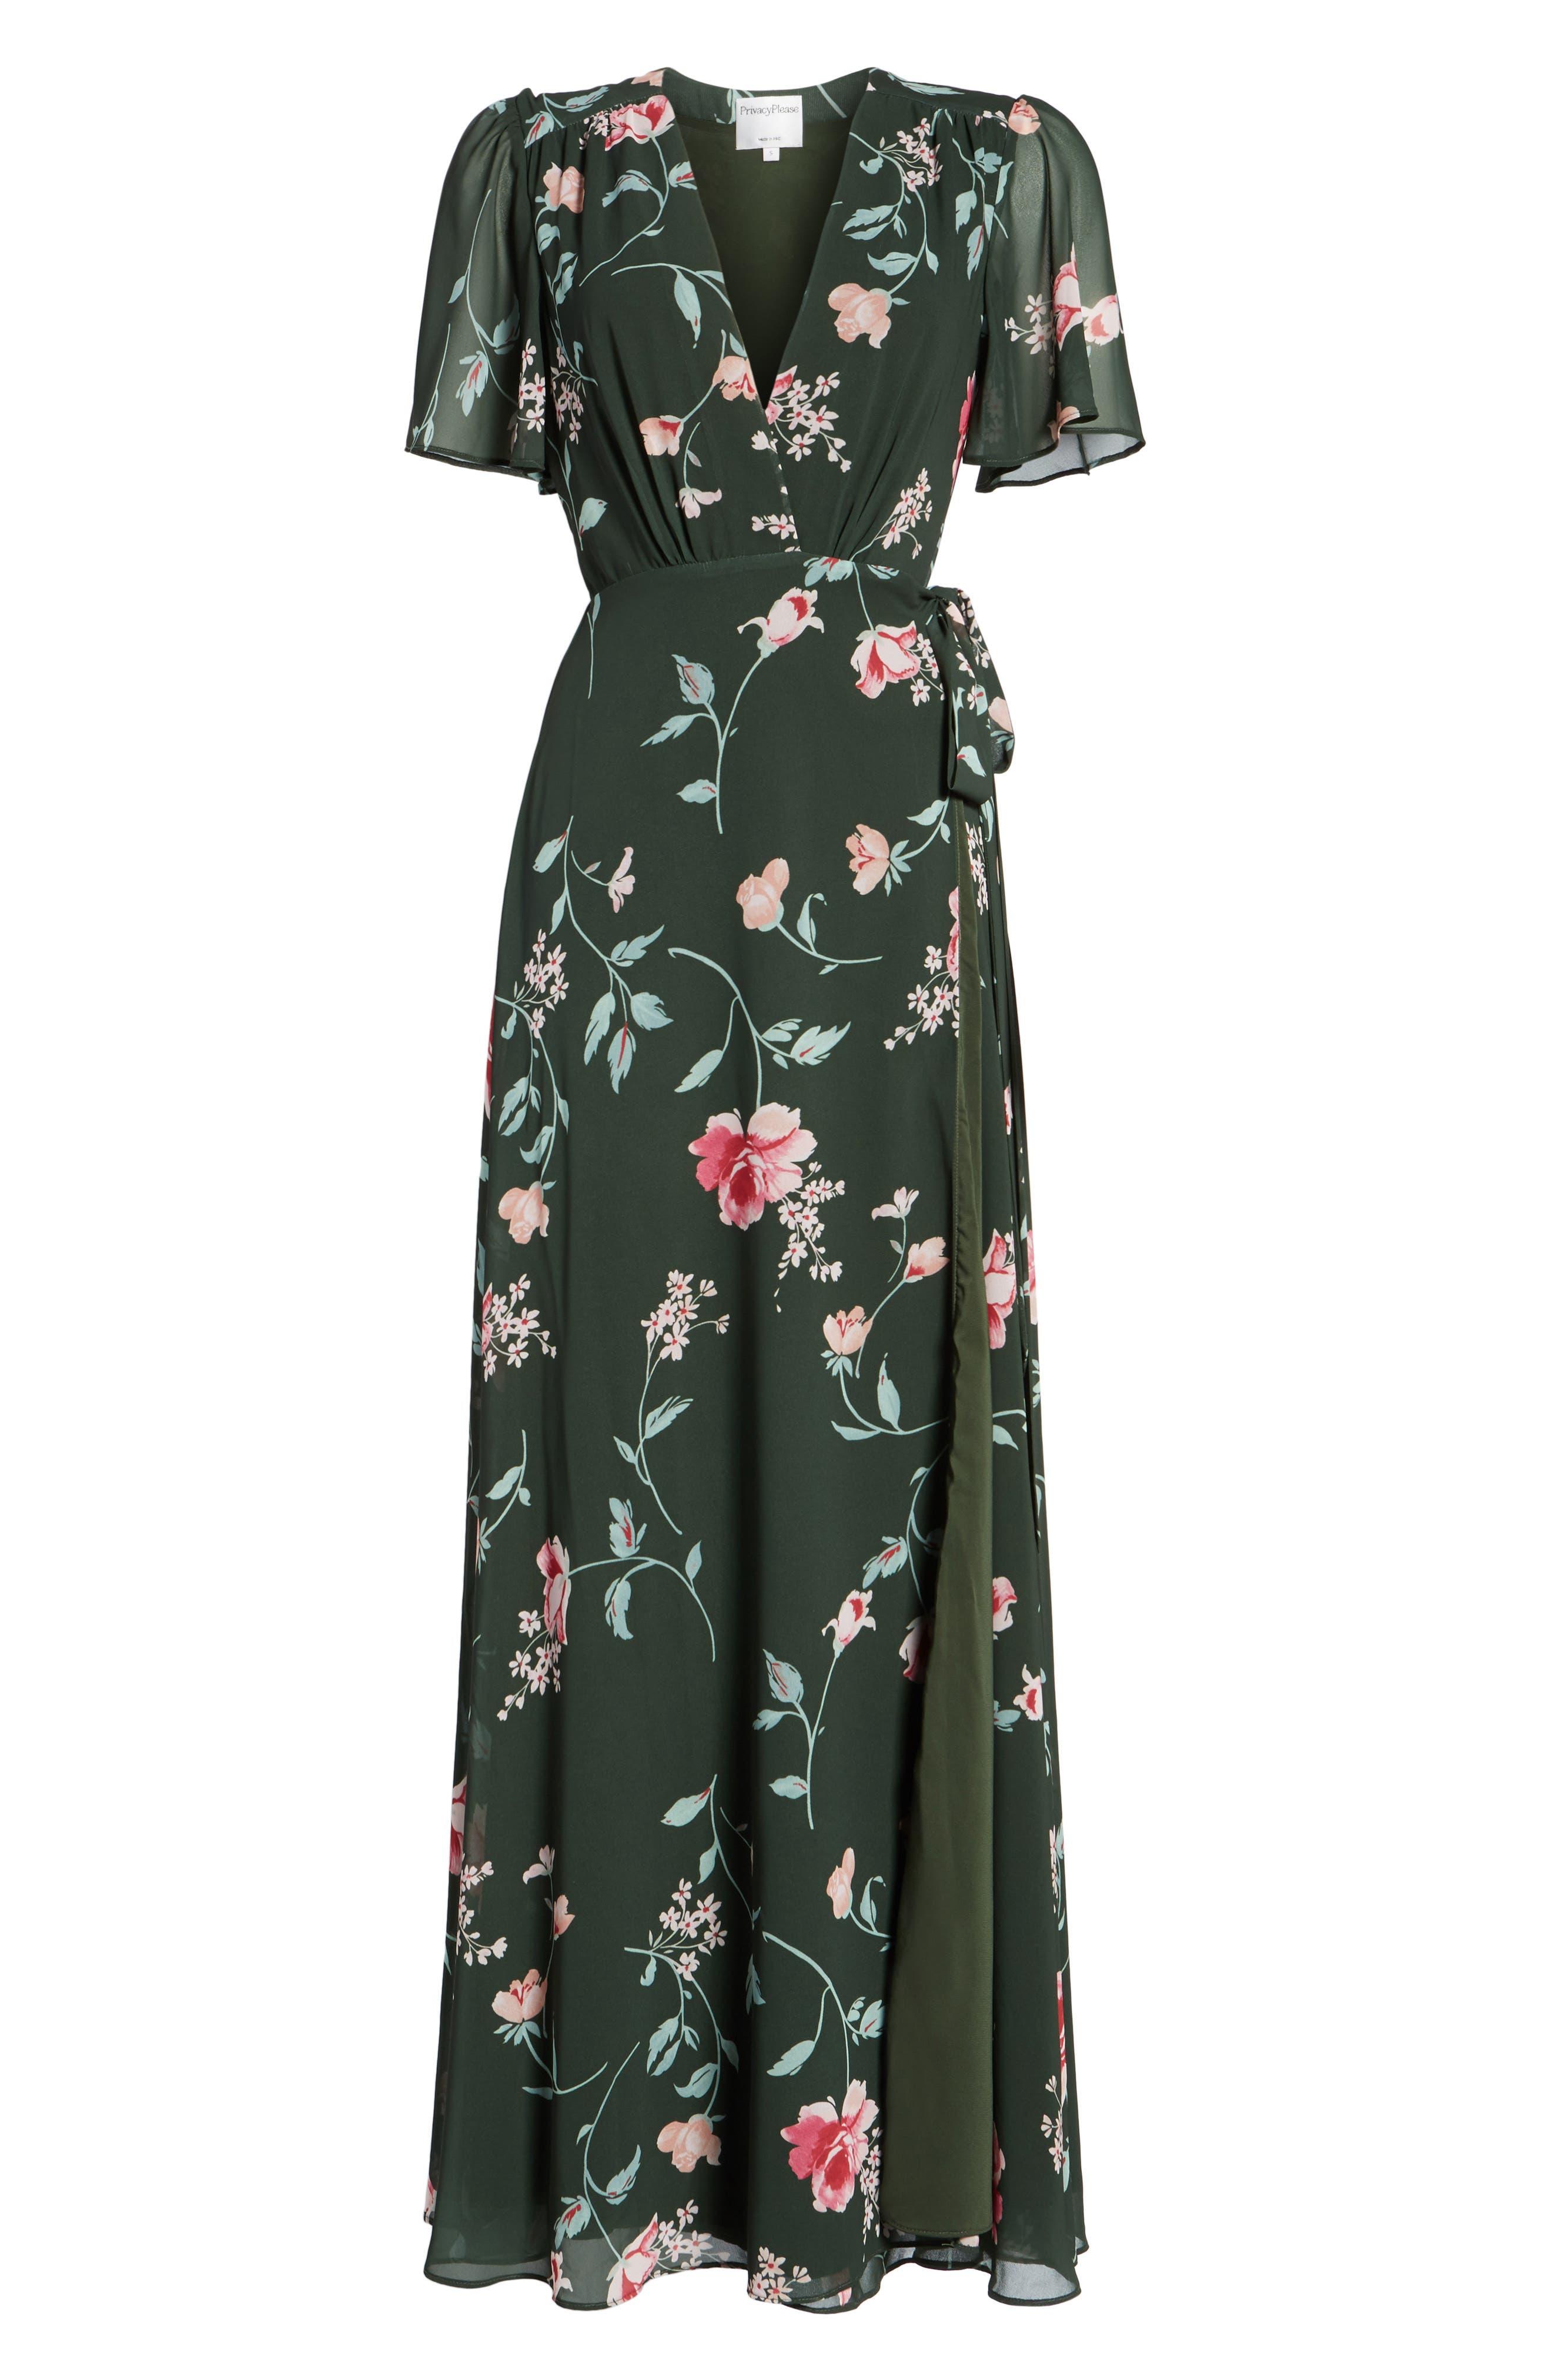 Plaza Kimono Maxi Dress,                             Alternate thumbnail 6, color,                             Evergreen Floral